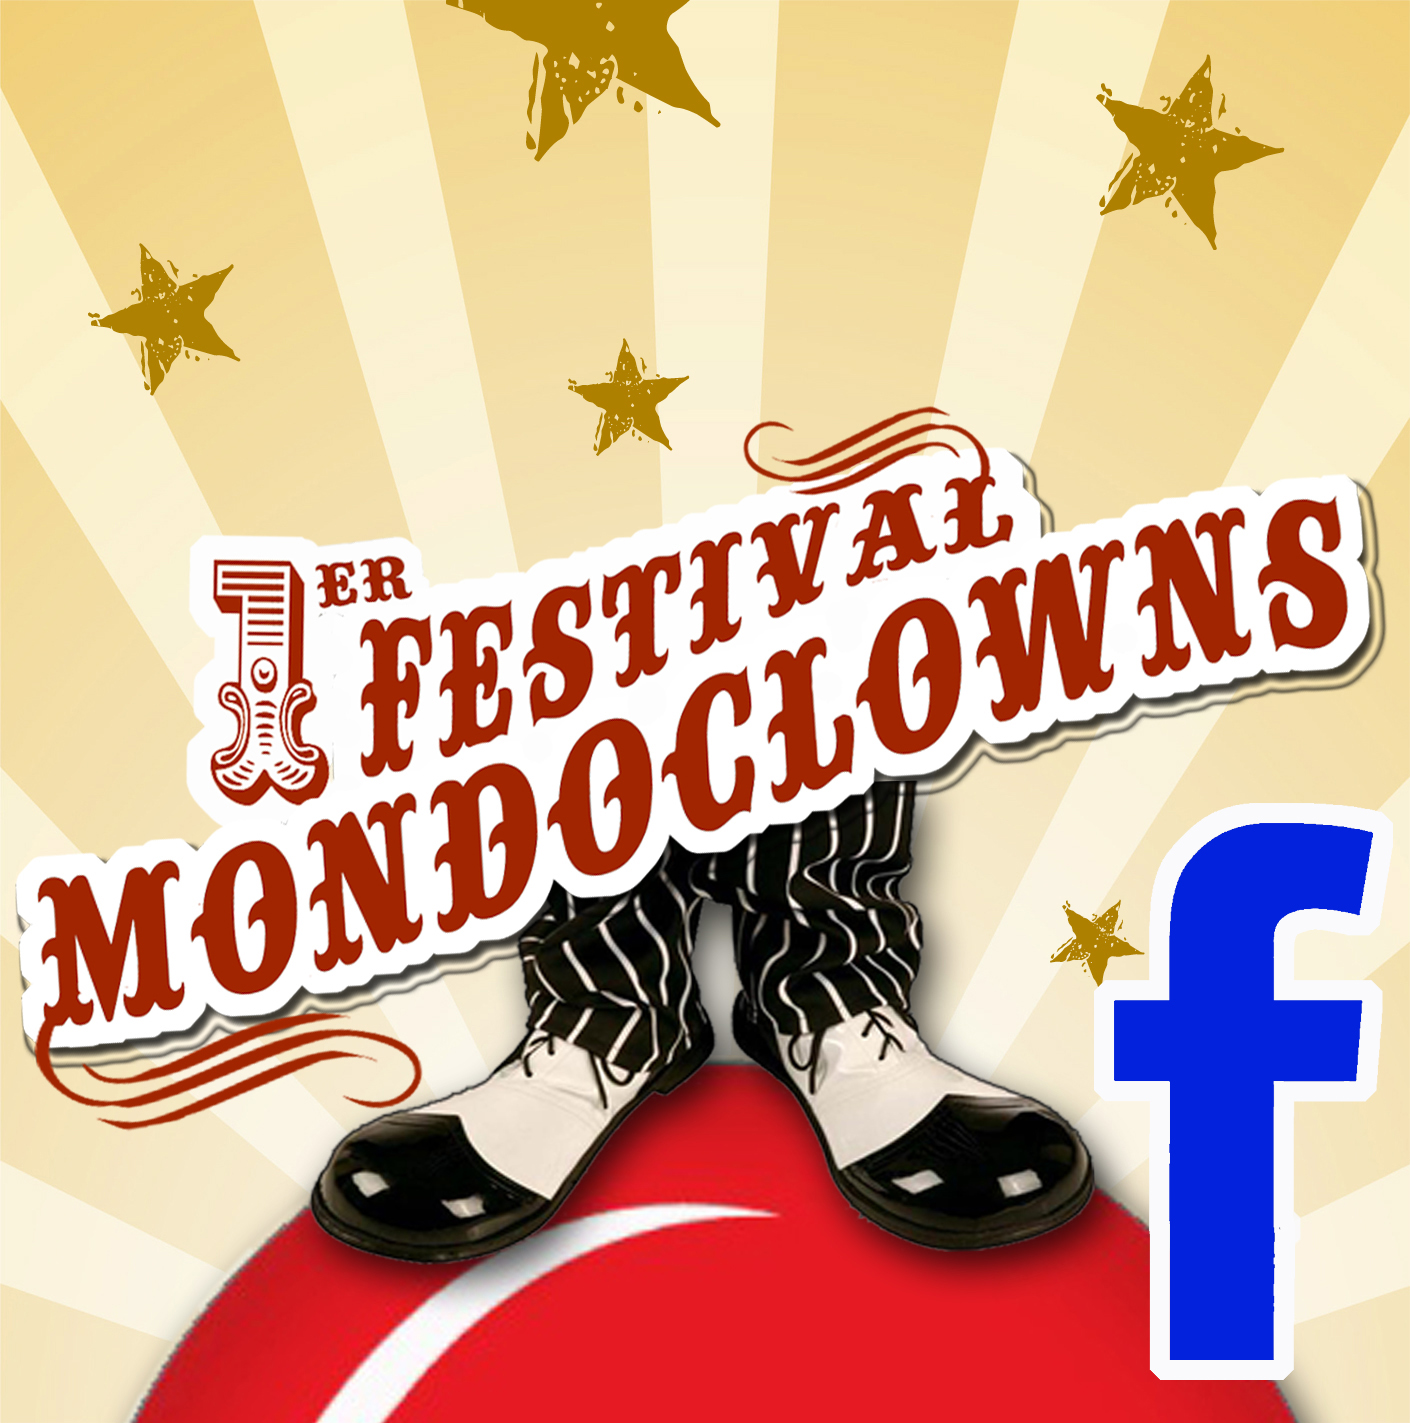 Mondoclowns